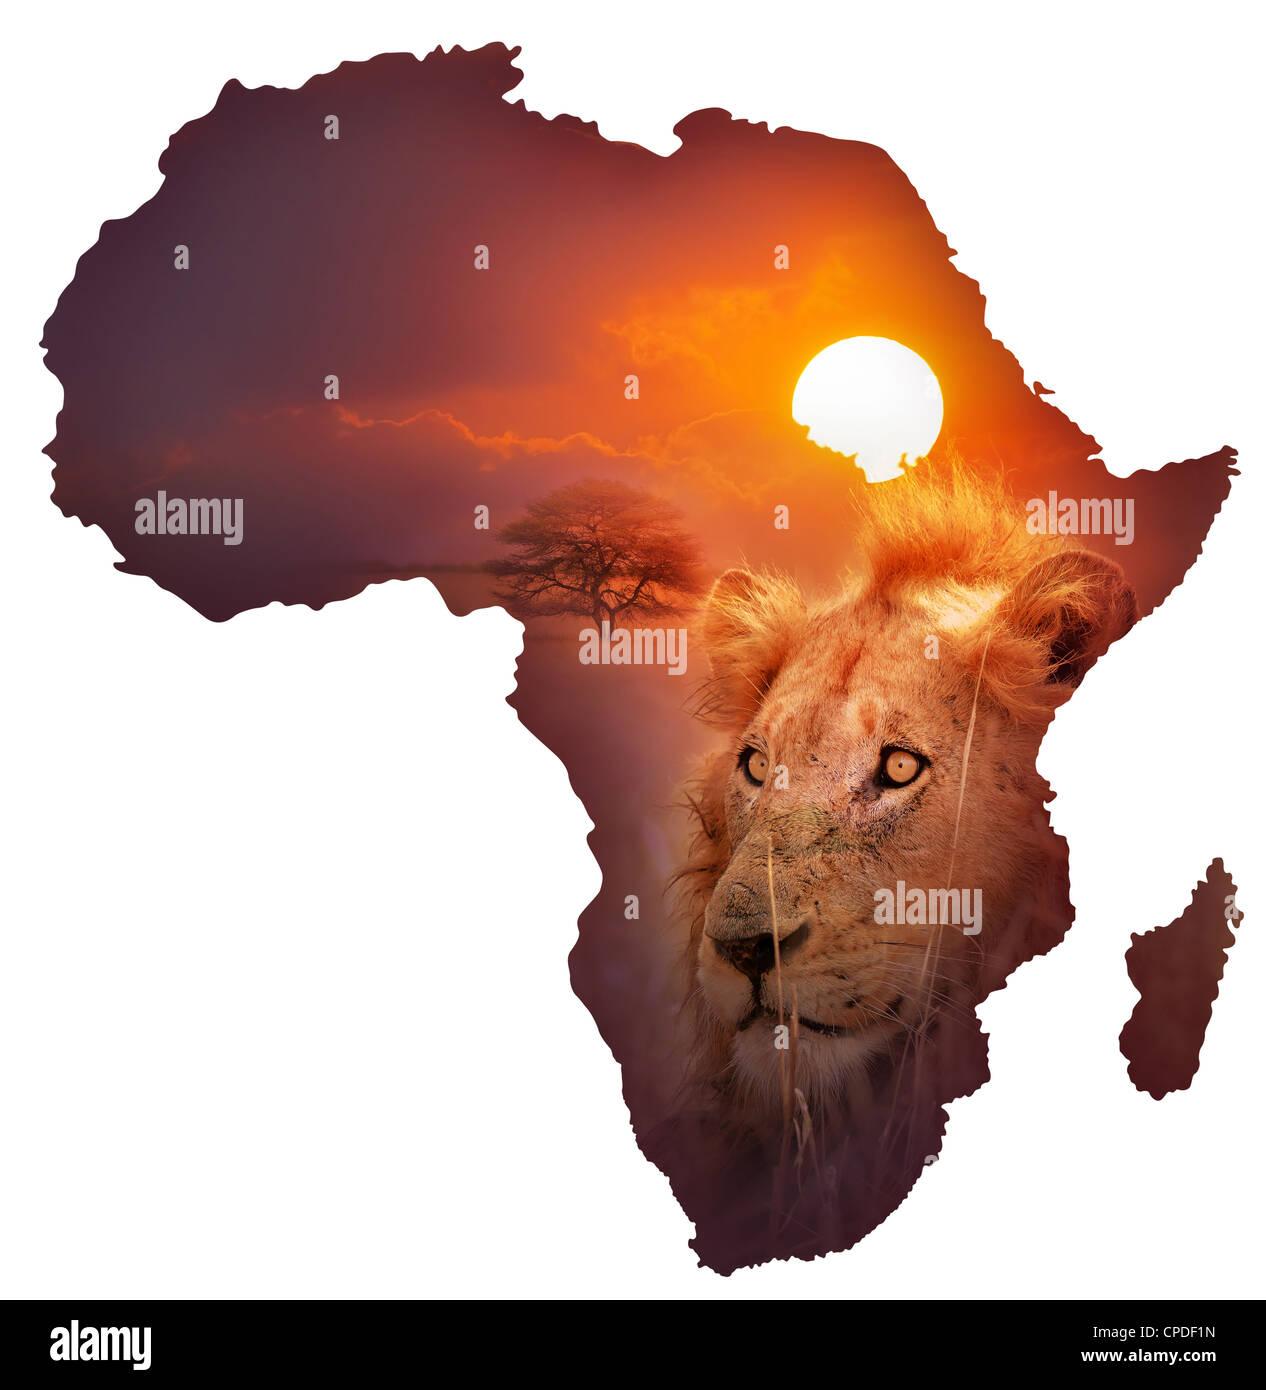 Africa Wildlife Map Design Isolated on White Stock Photo 48240353